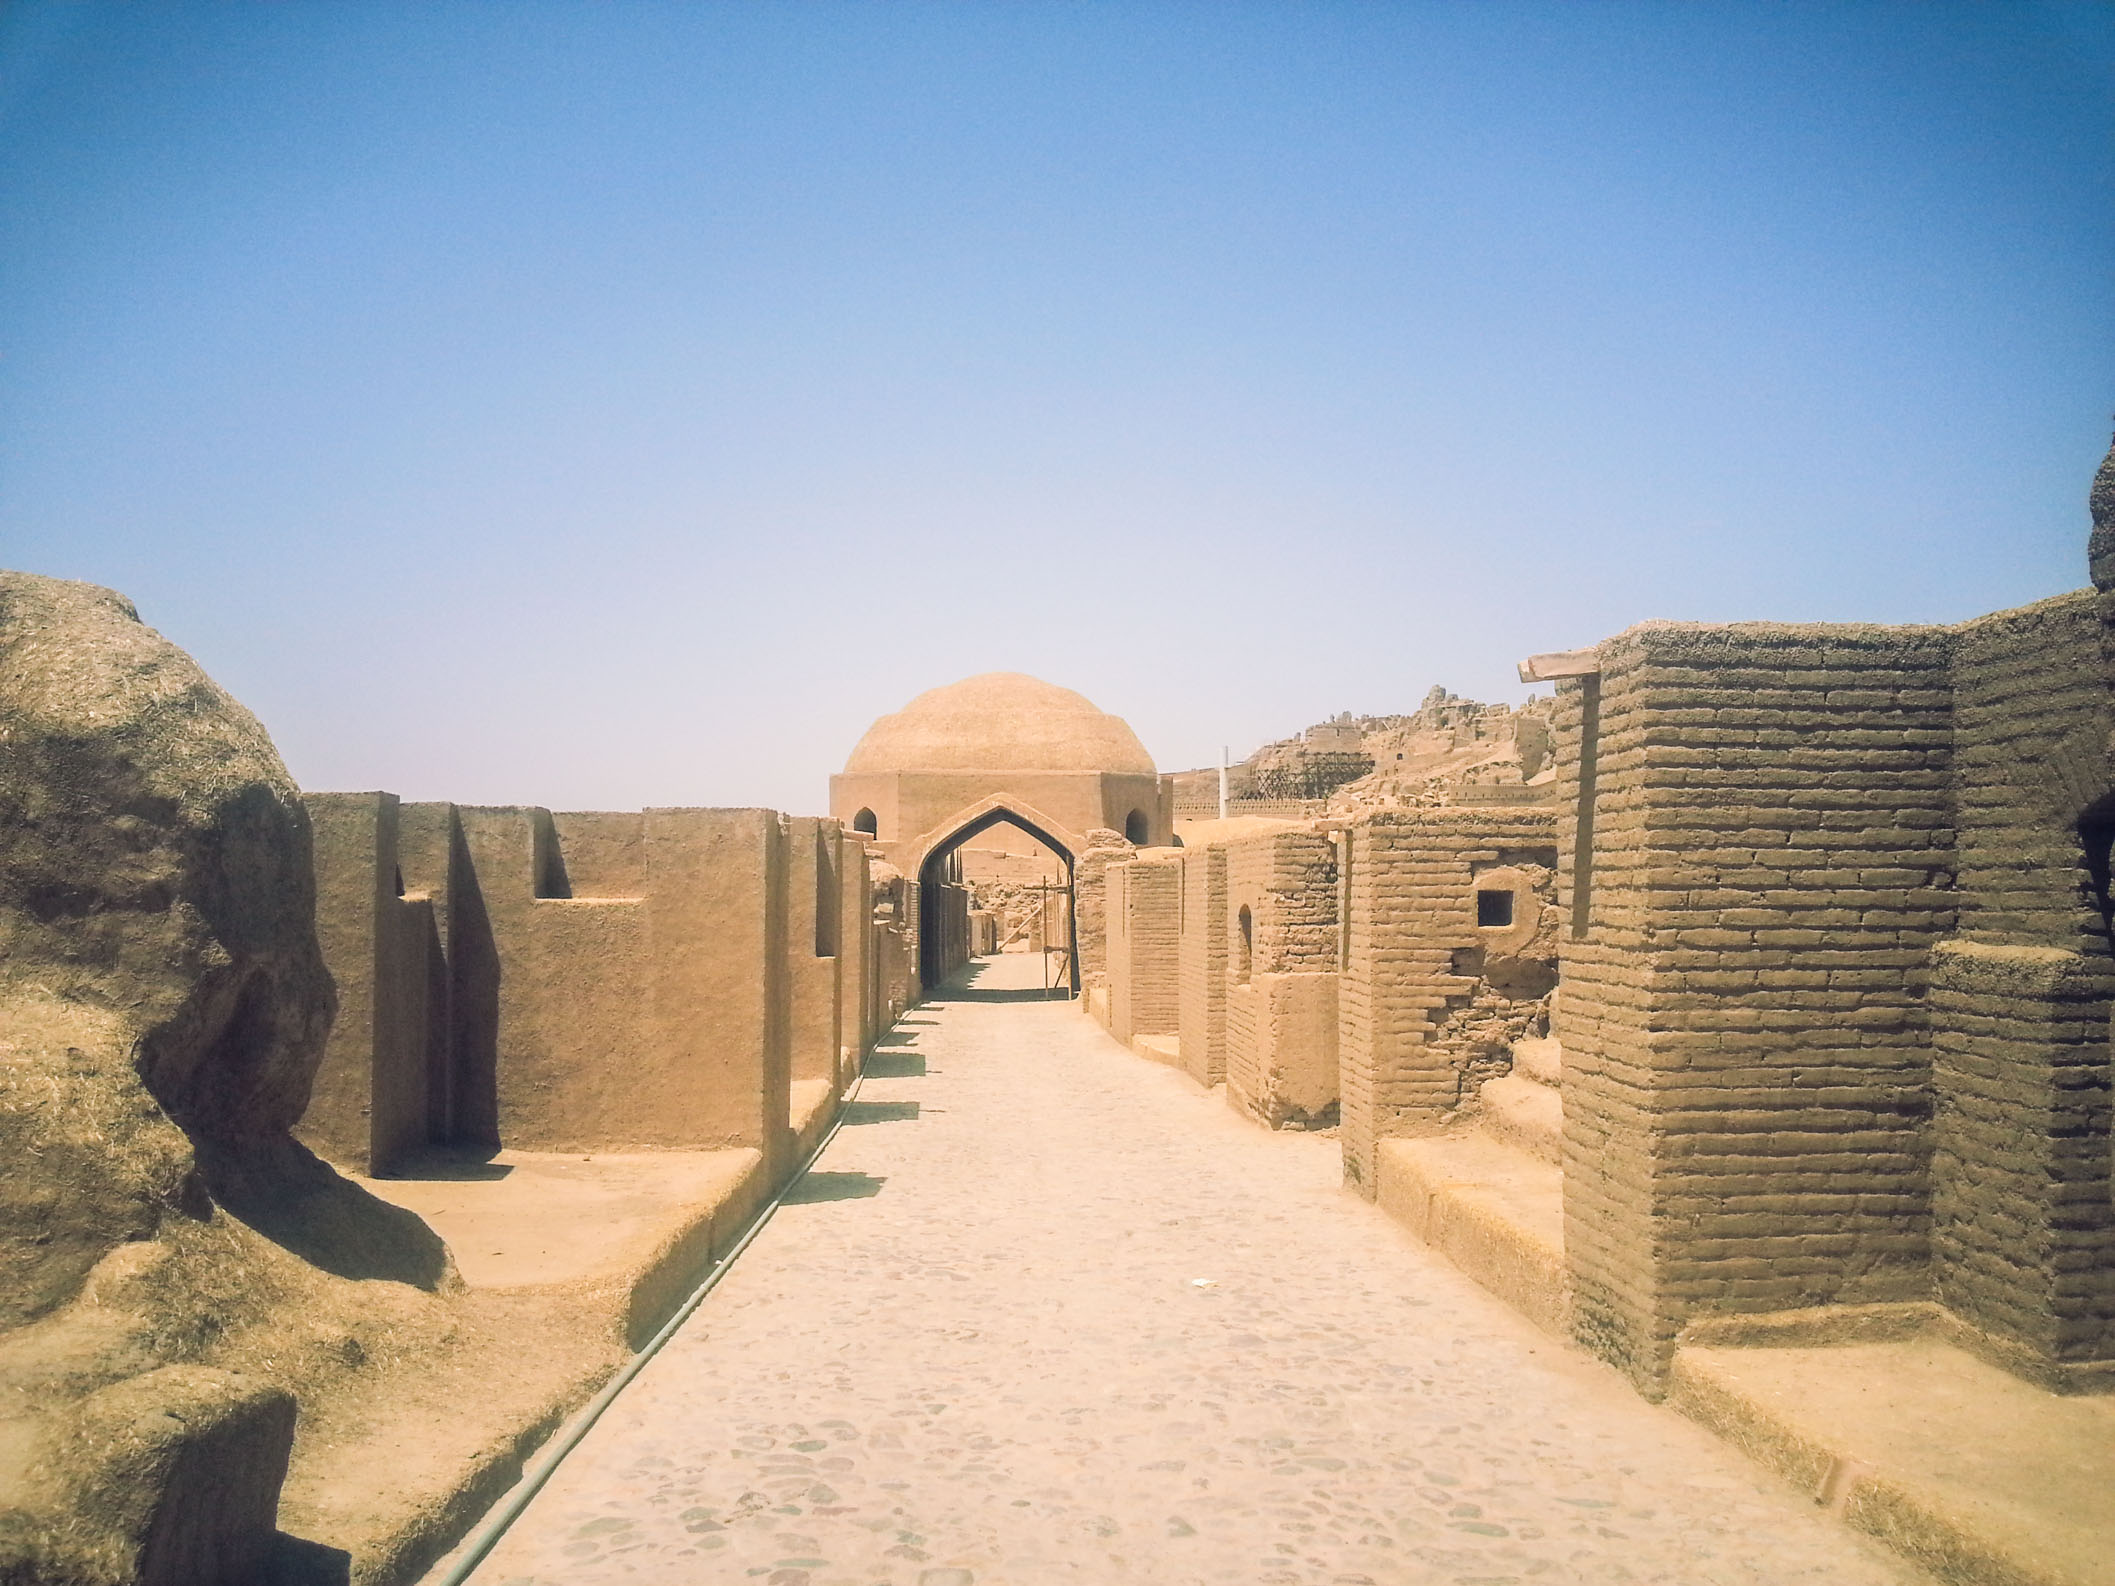 Rebuilt part of Bam in south Iran